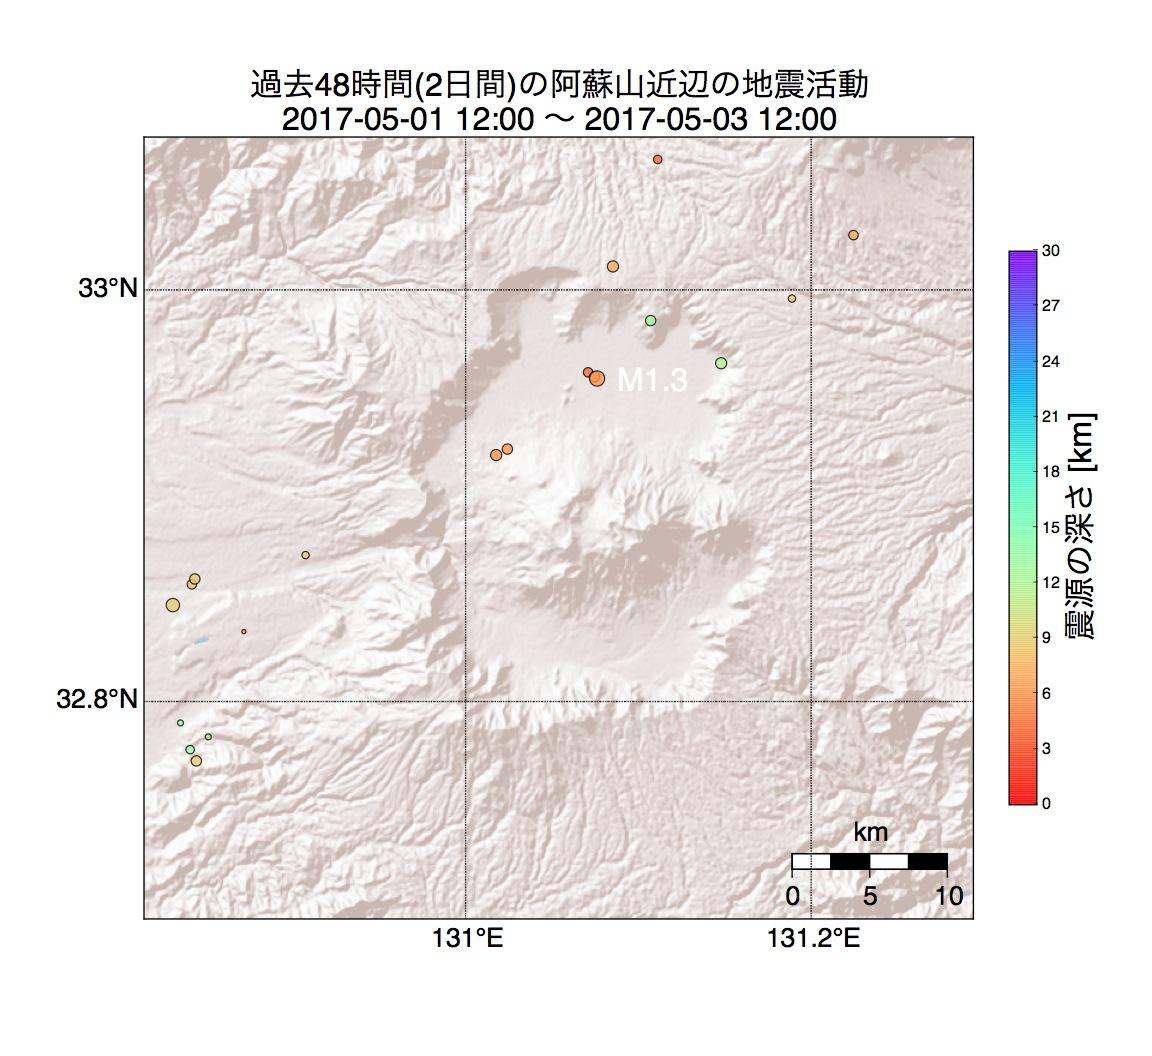 http://jishin.chamu.org/aso/20170503_1.jpg